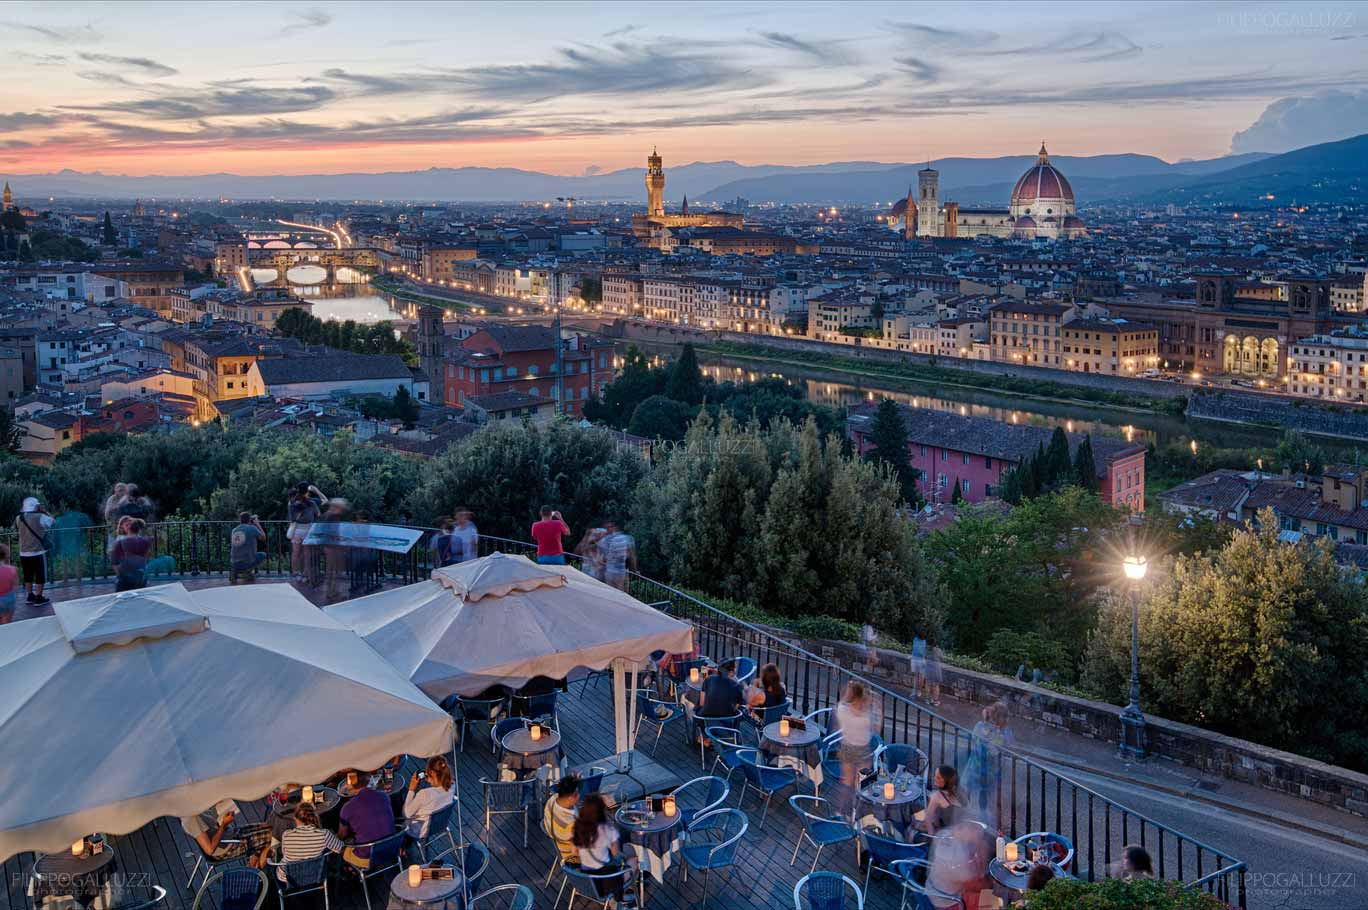 Firenze cityscape from piazzale Michelangelo